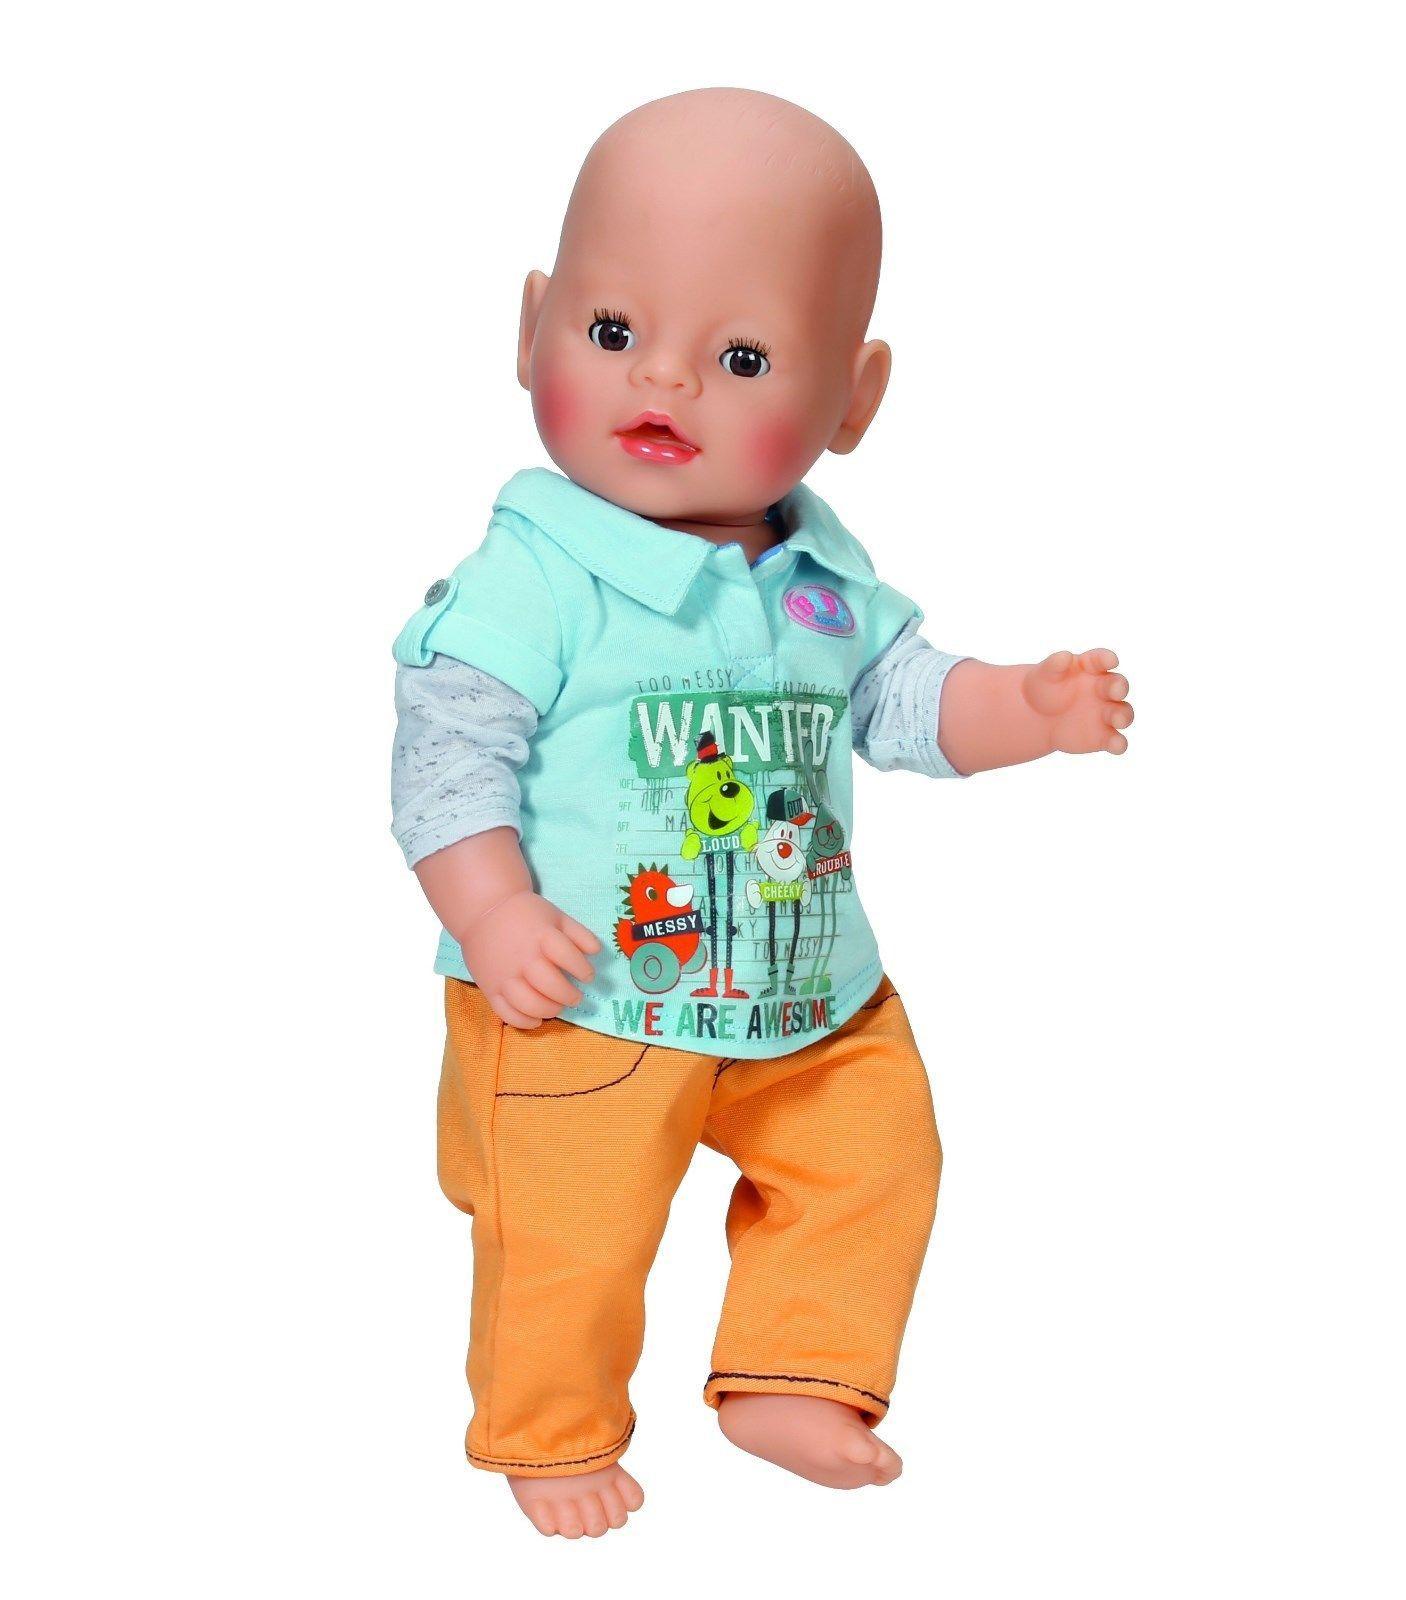 Zapf Creation Baby Born Jungs Kollektion 822197 Spielzeug Brandtoys Ebay Baby Born Junge Zapf Creation Baby